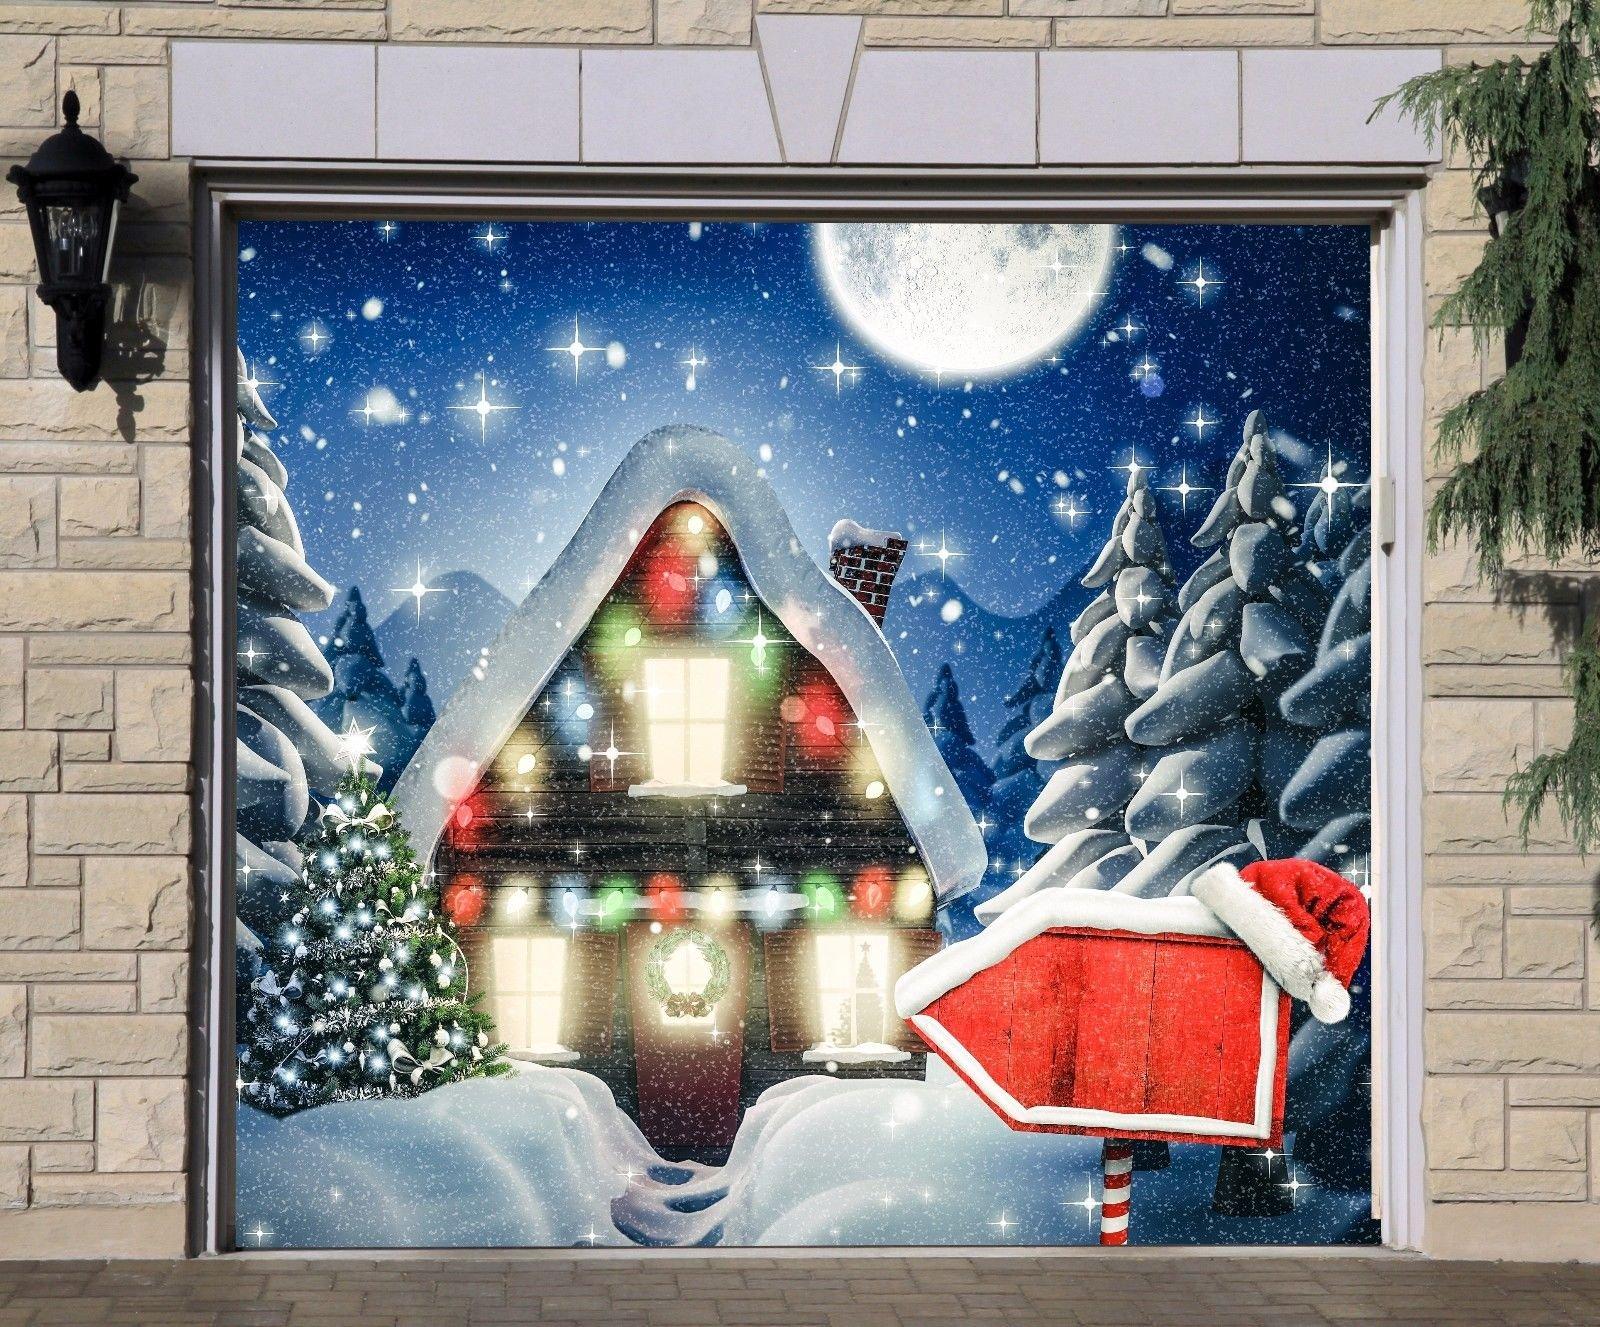 Christmas House Single Garage Door Covers Billboard Full Color 3D Effect Print Door Decor Decorations of House Garage Holiday Mural Banner Garage Door Banner Size 83 x 96 inches DAV117